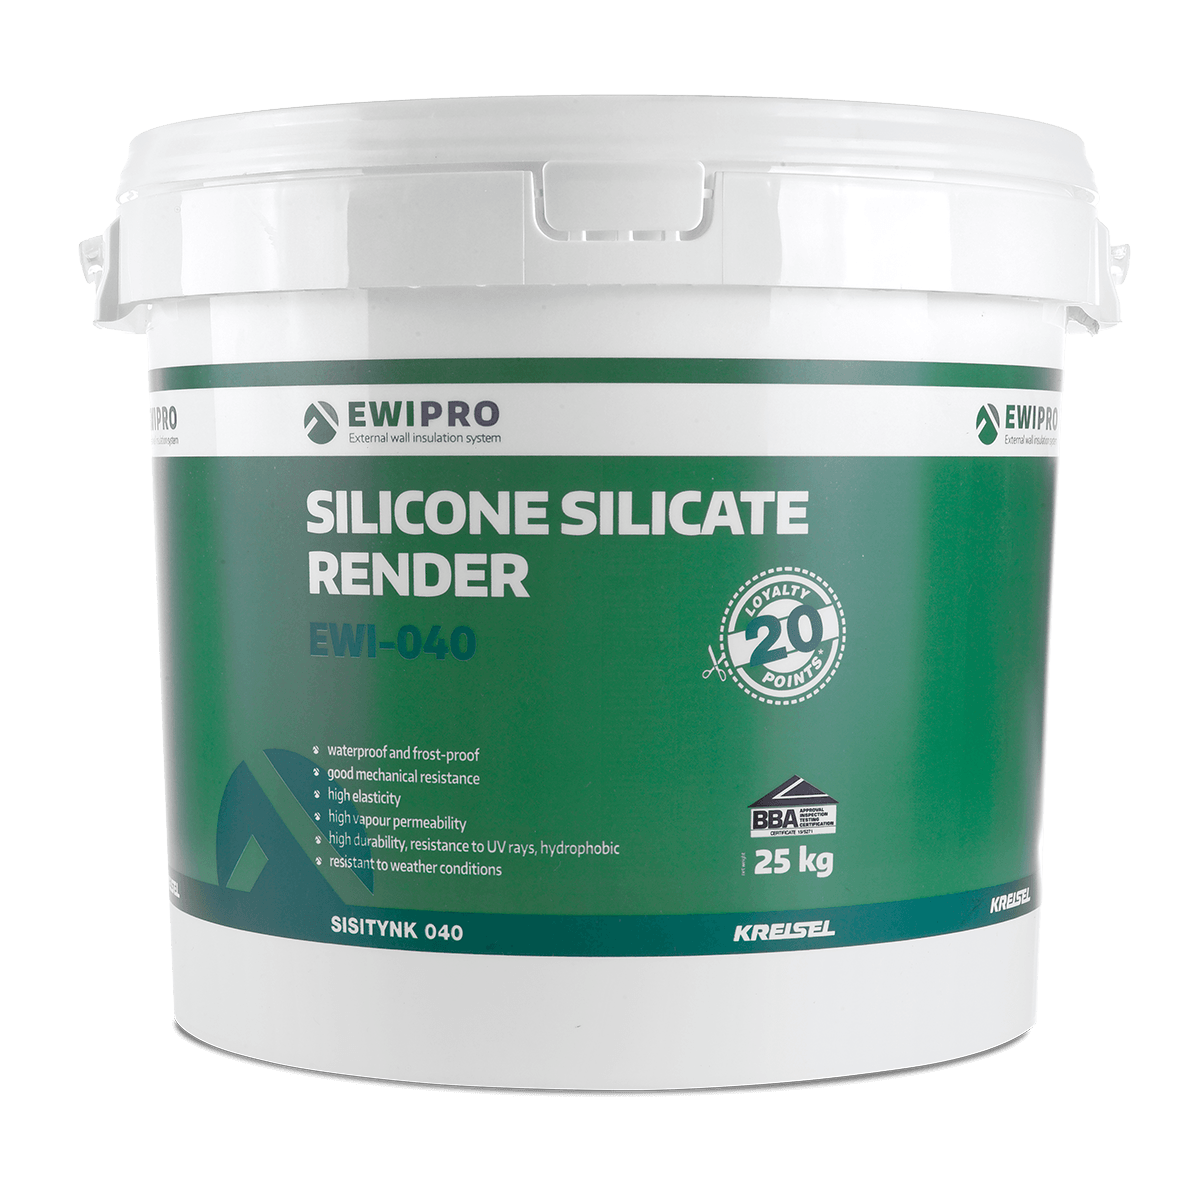 Silicone Silicate Render EWI-040 - EWI Pro Renders